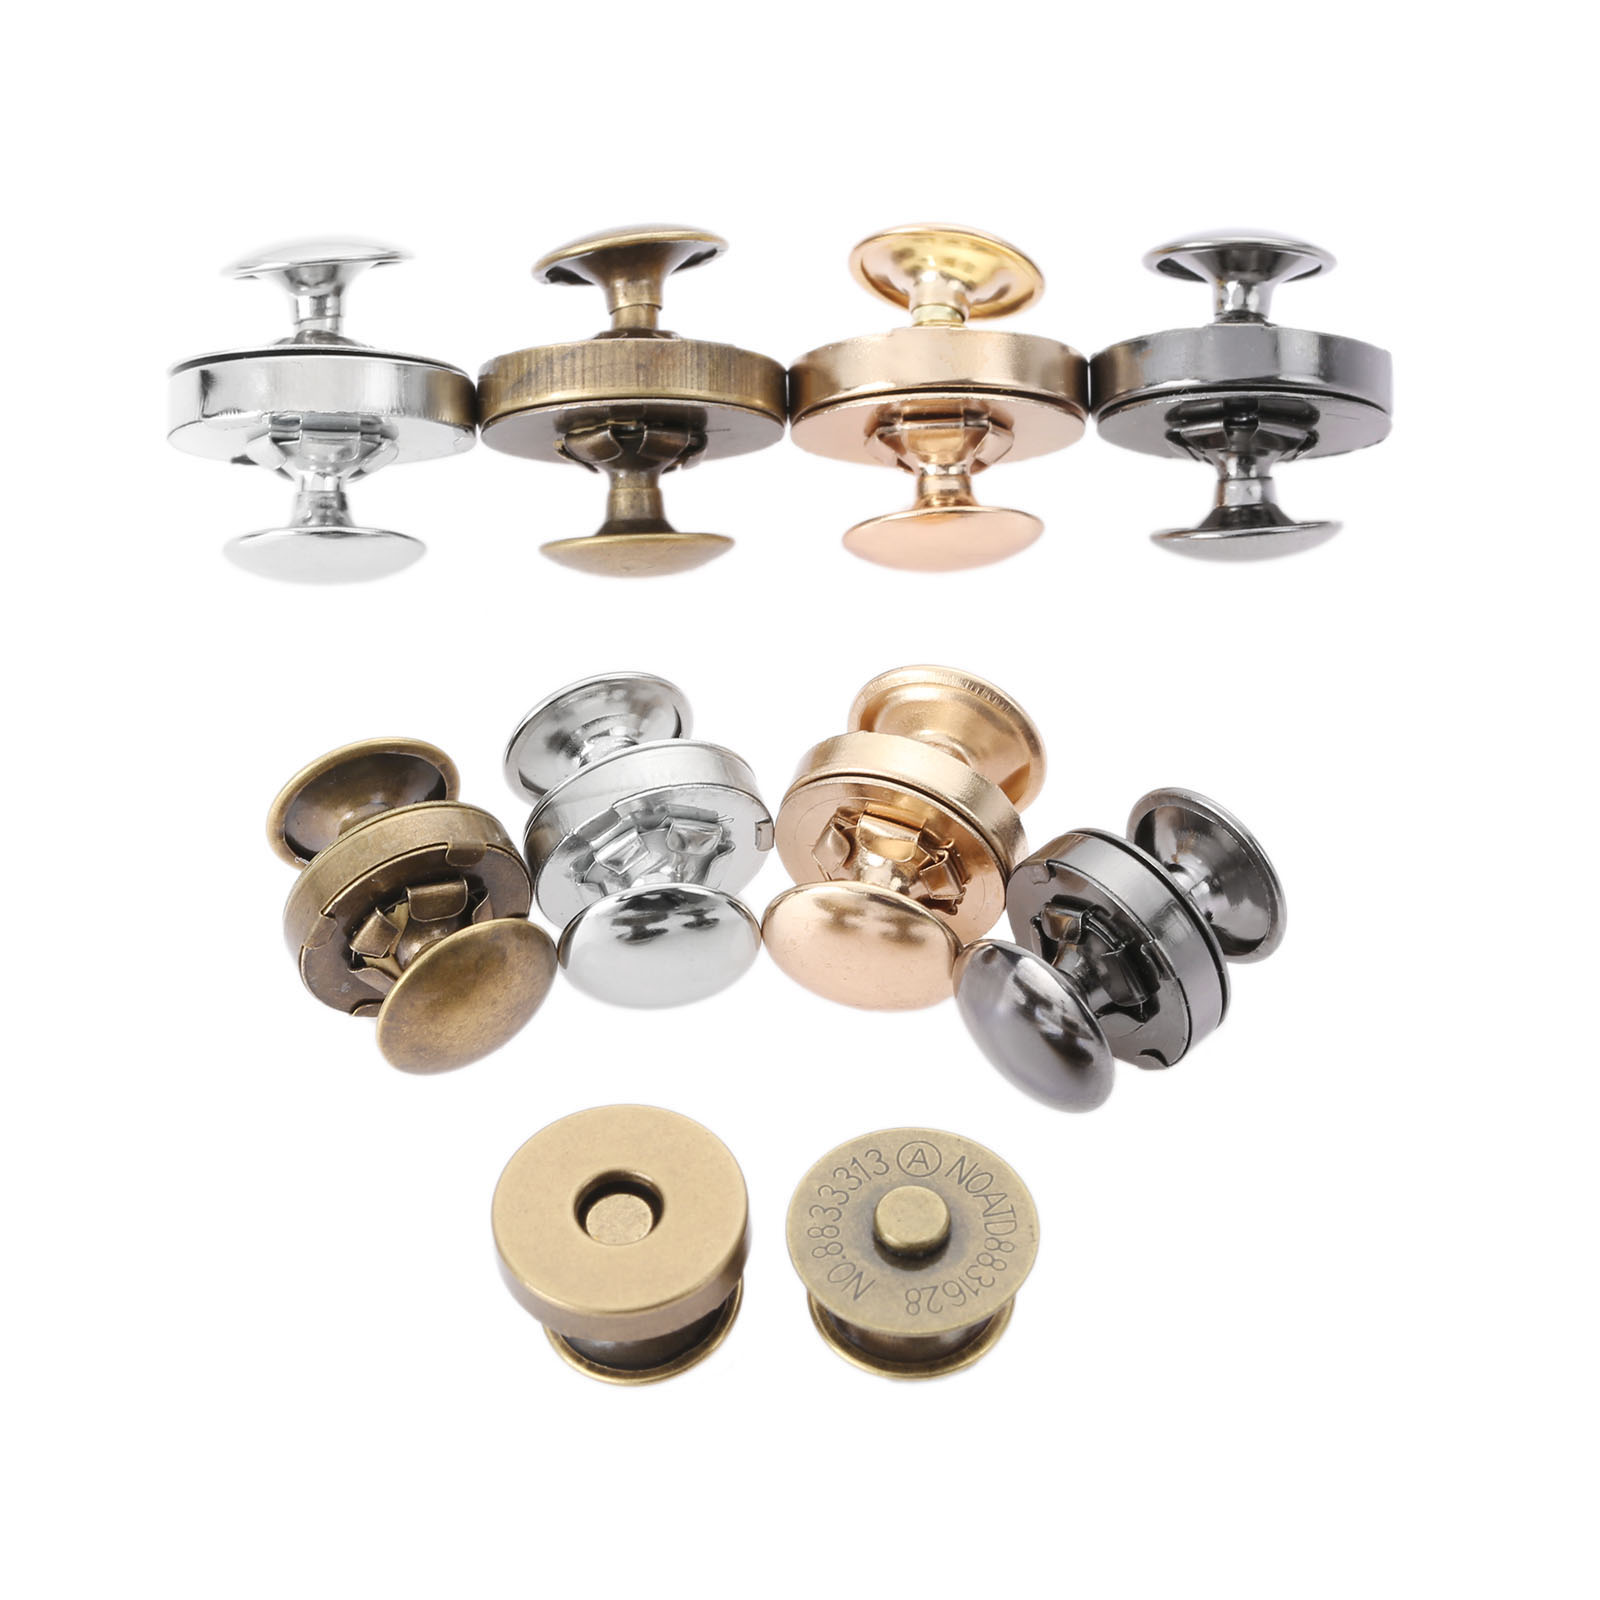 10Sets 14mm 18mm Double Rivets Magnetic Buttons Metal Magnet Buttons For Handbag